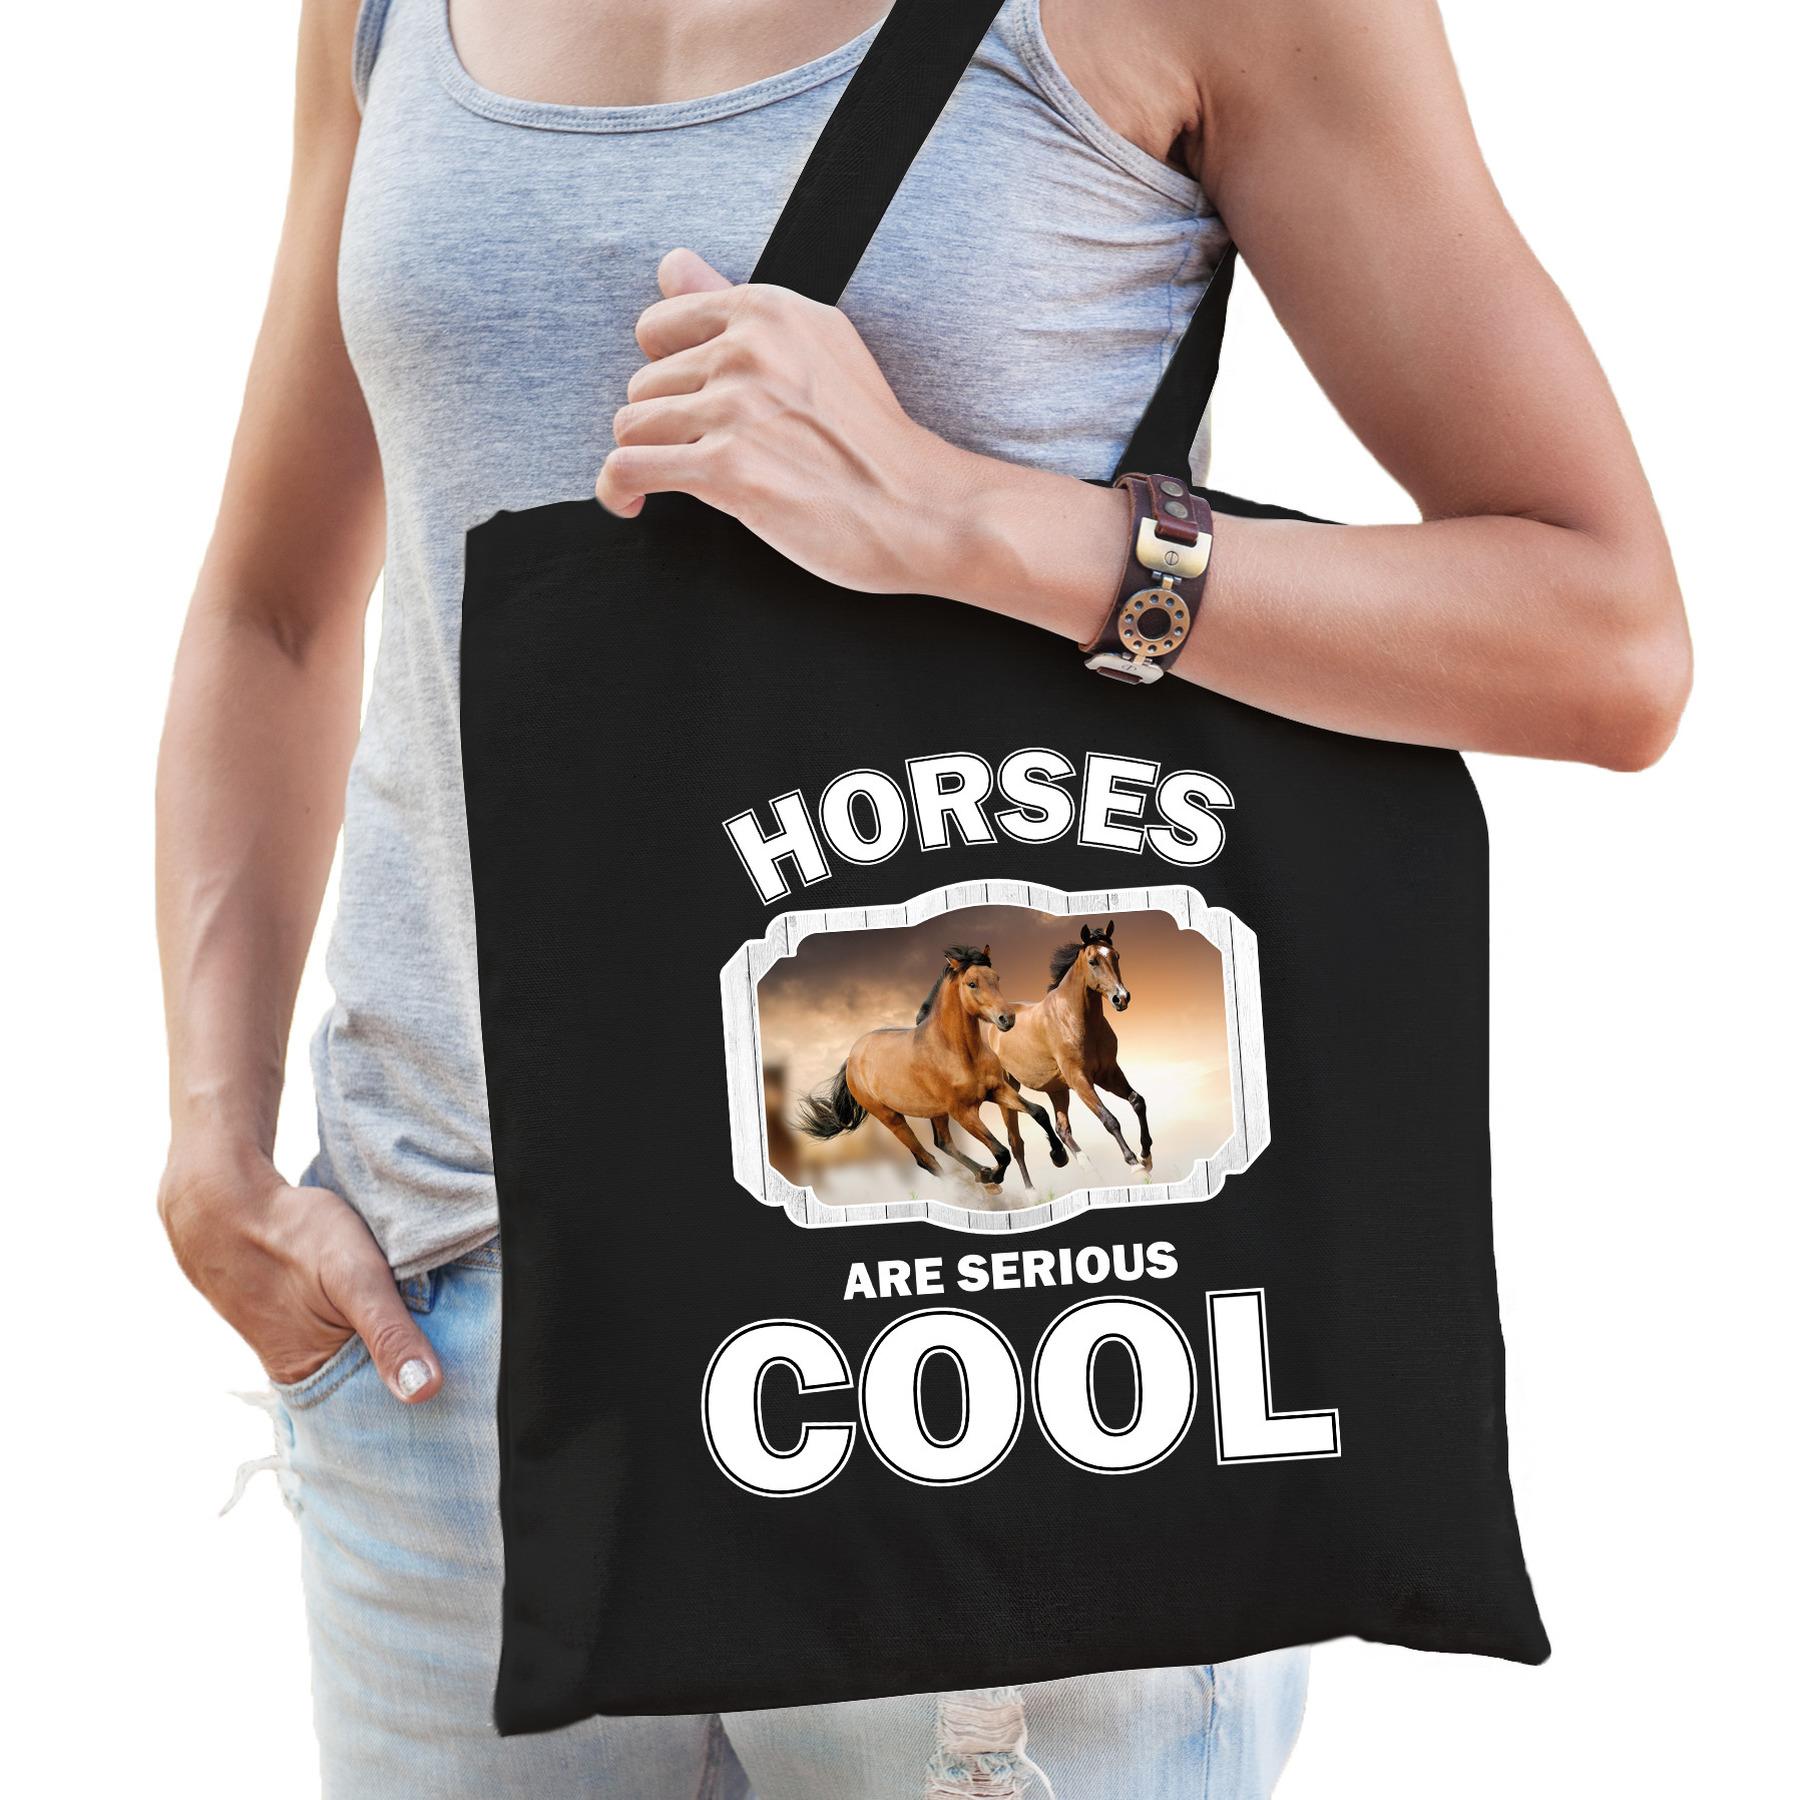 Katoenen tasje horses are serious cool zwart - paarden/ bruin paard cadeau tas